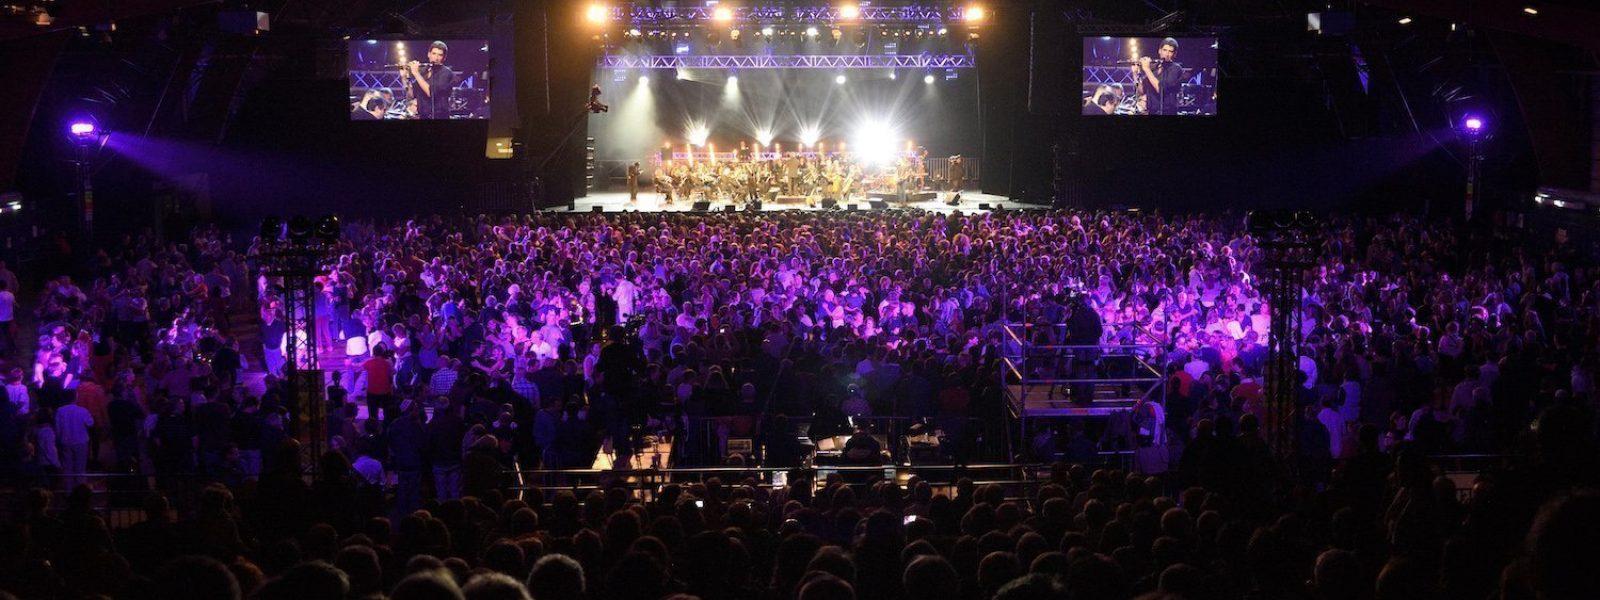 Festnoz au festival Yaouank à Rennes